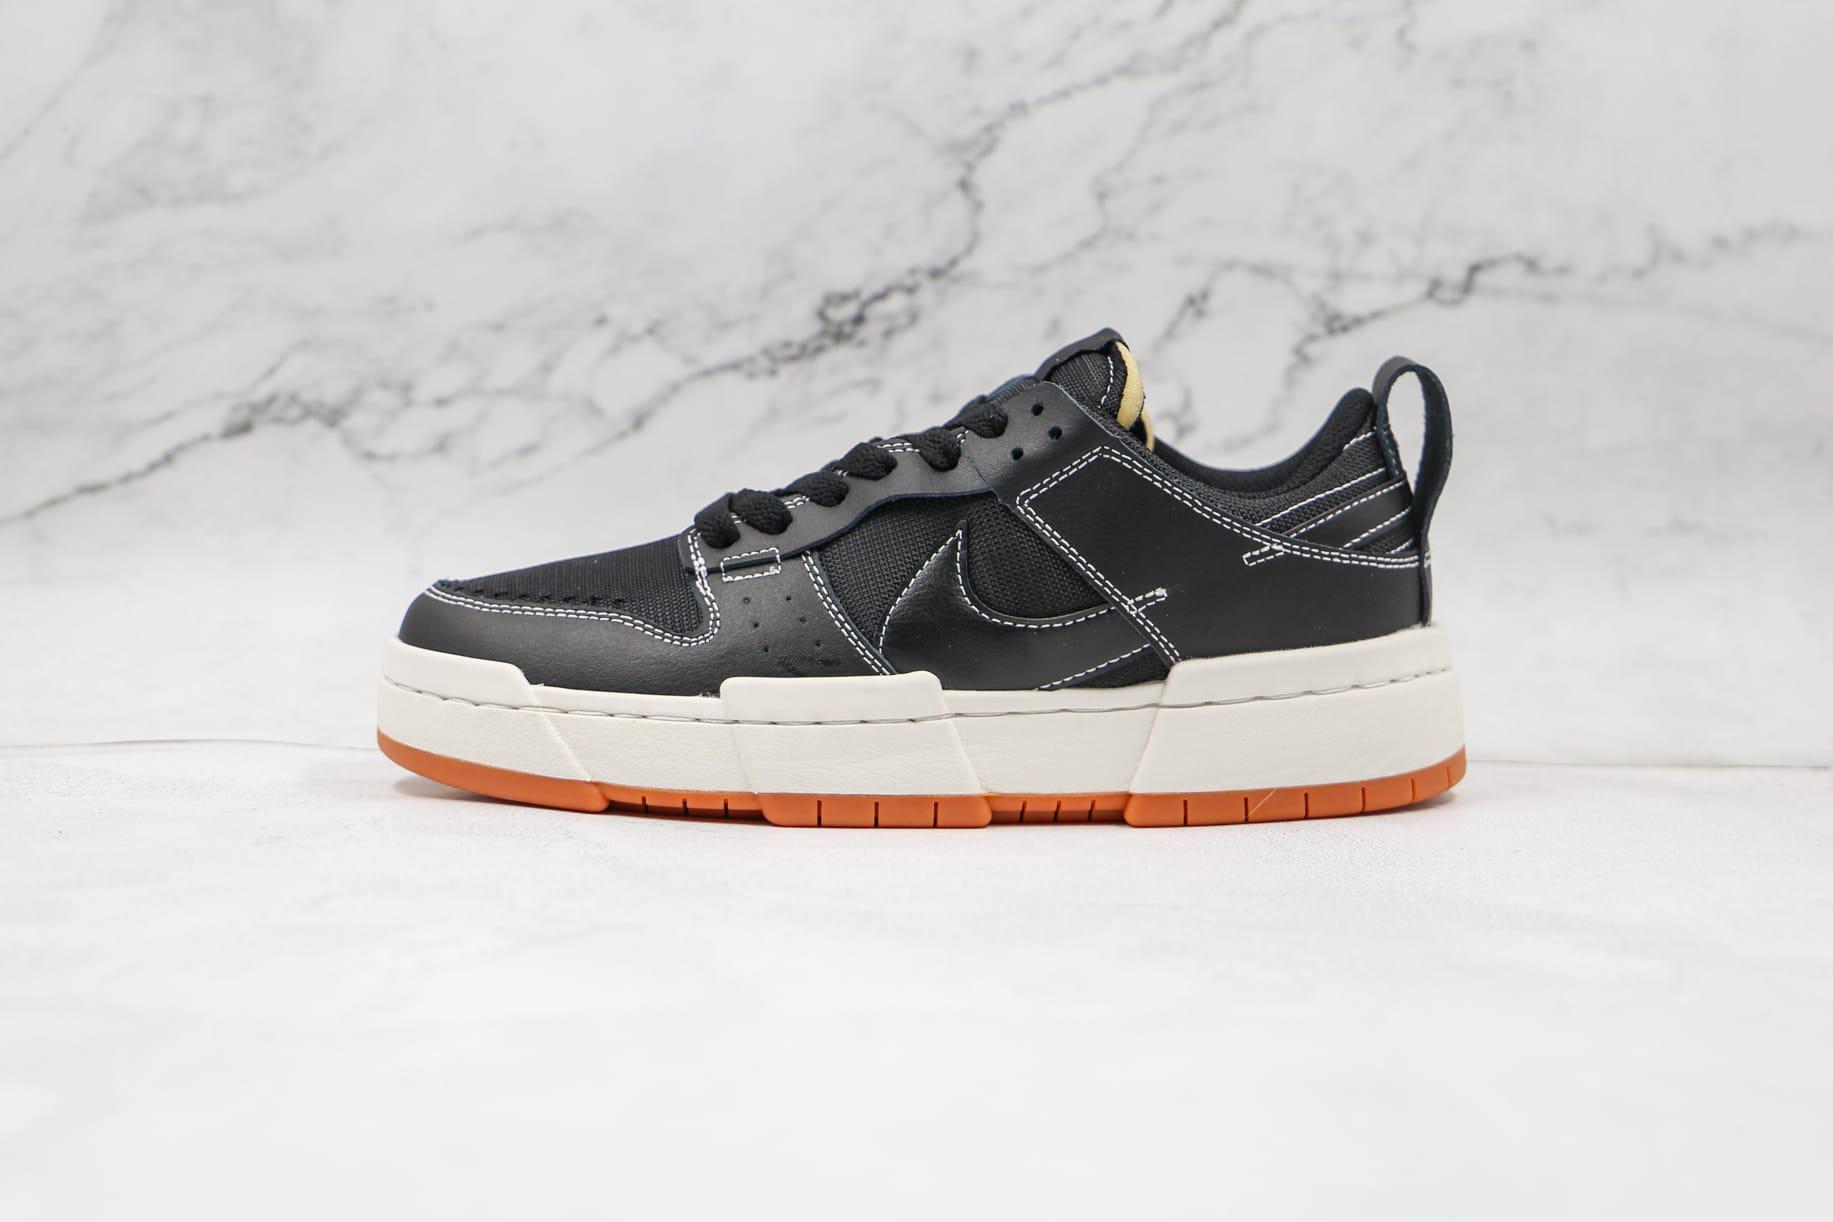 Nike Dunk Low Disrupt Black Gum W 1